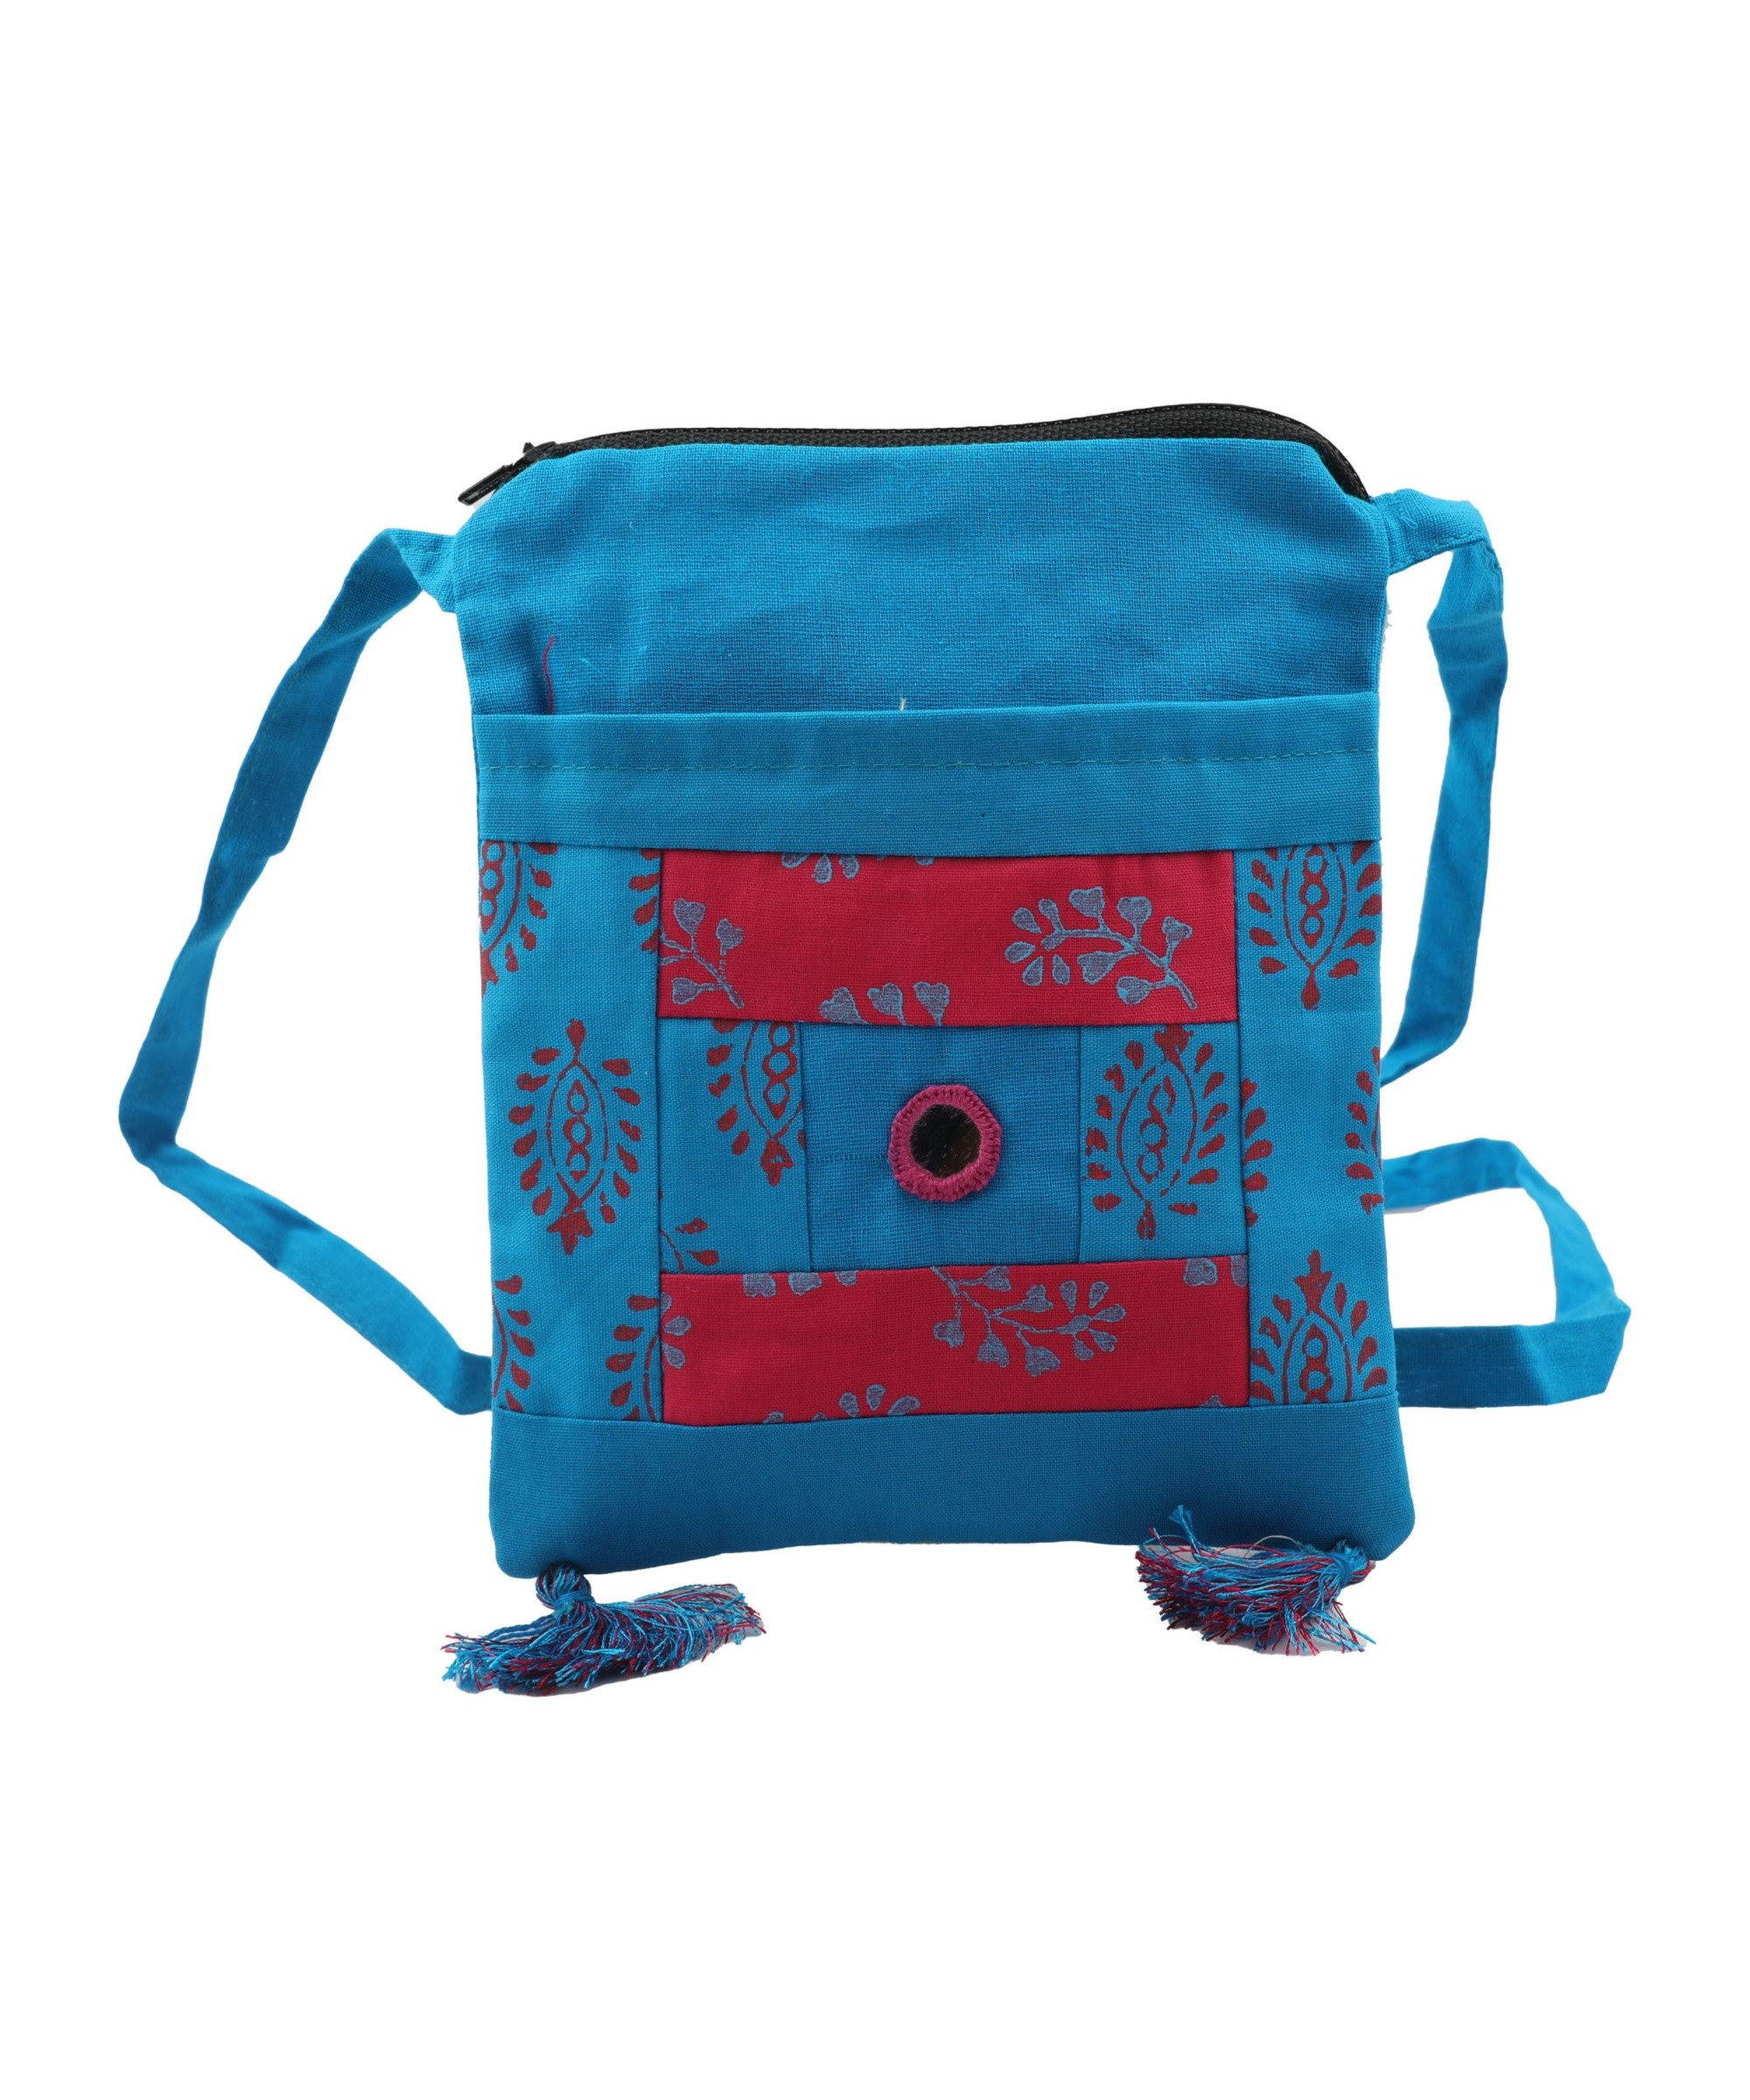 WIEA Blue Sling Bag (Set of 2)